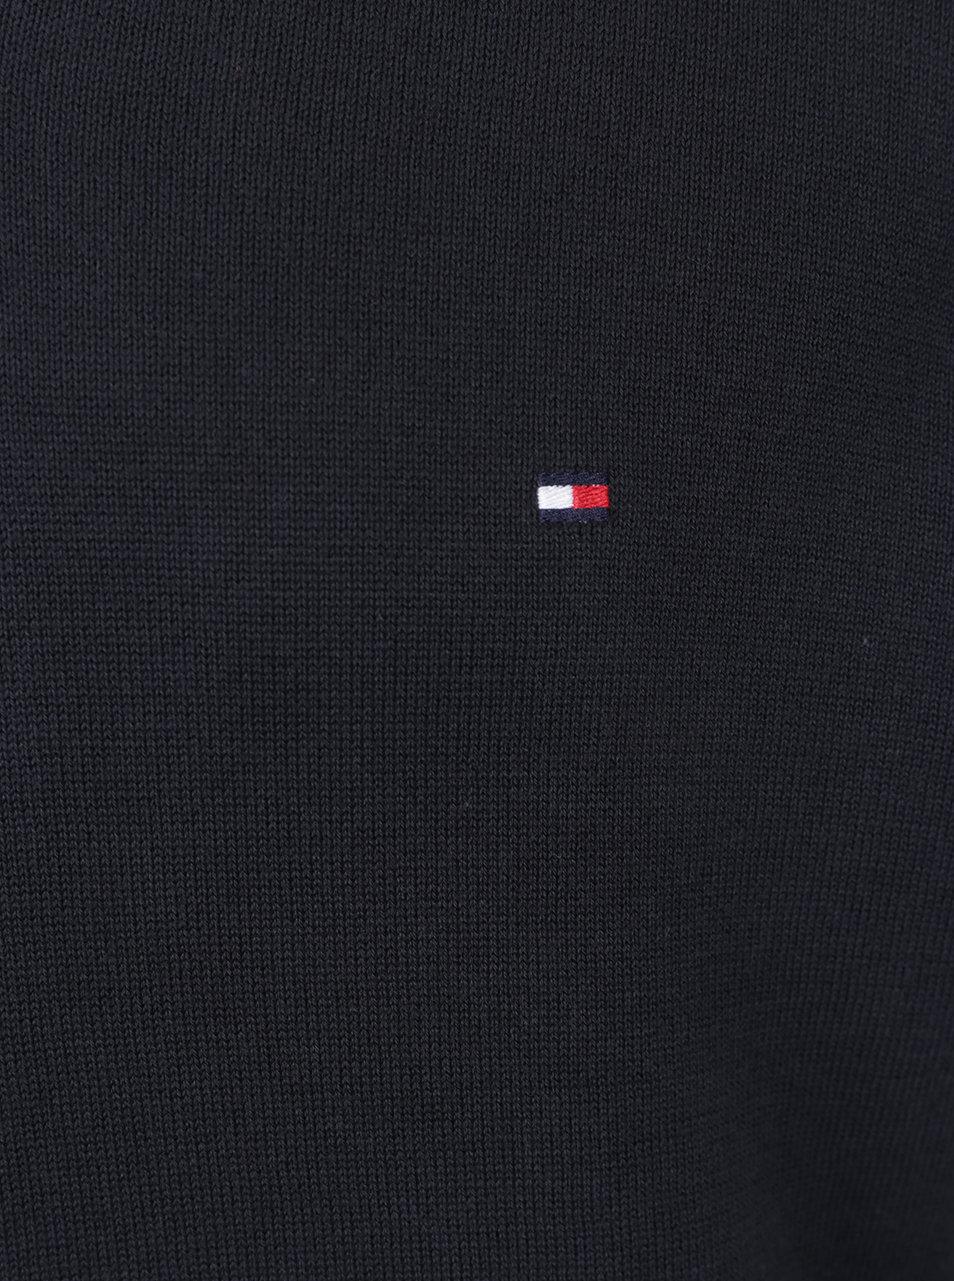 Tmavomodrý pánsky sveter s véčkovým výstrihom Tommy Hilfiger ... 2d775619d9a